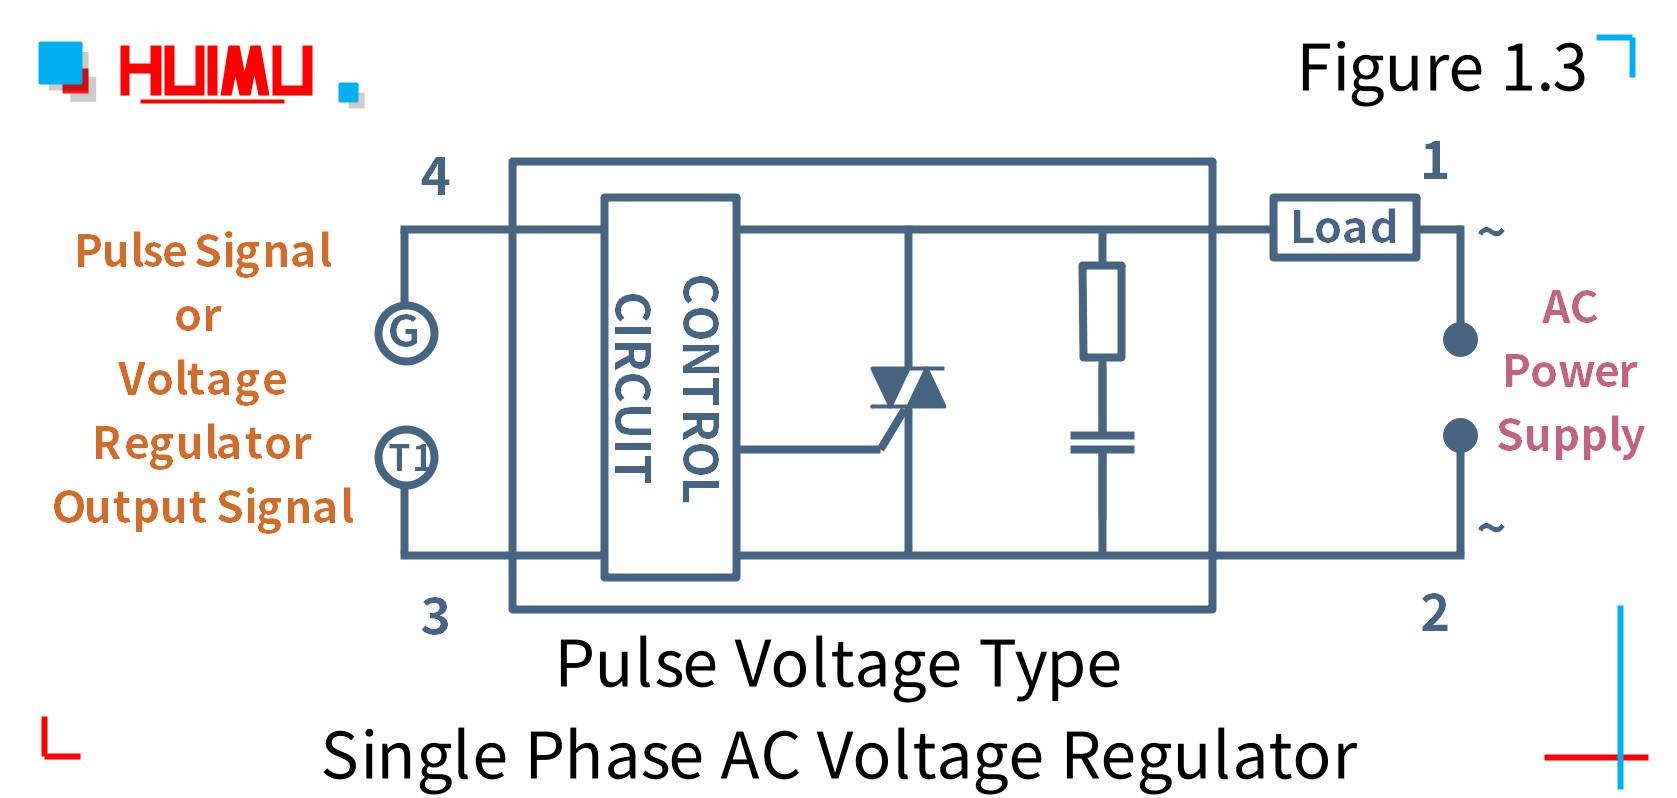 How to wire MGR mager MGR-25DV digital signal type single phase AC voltage regulator? More detail via www.@huimultd.com